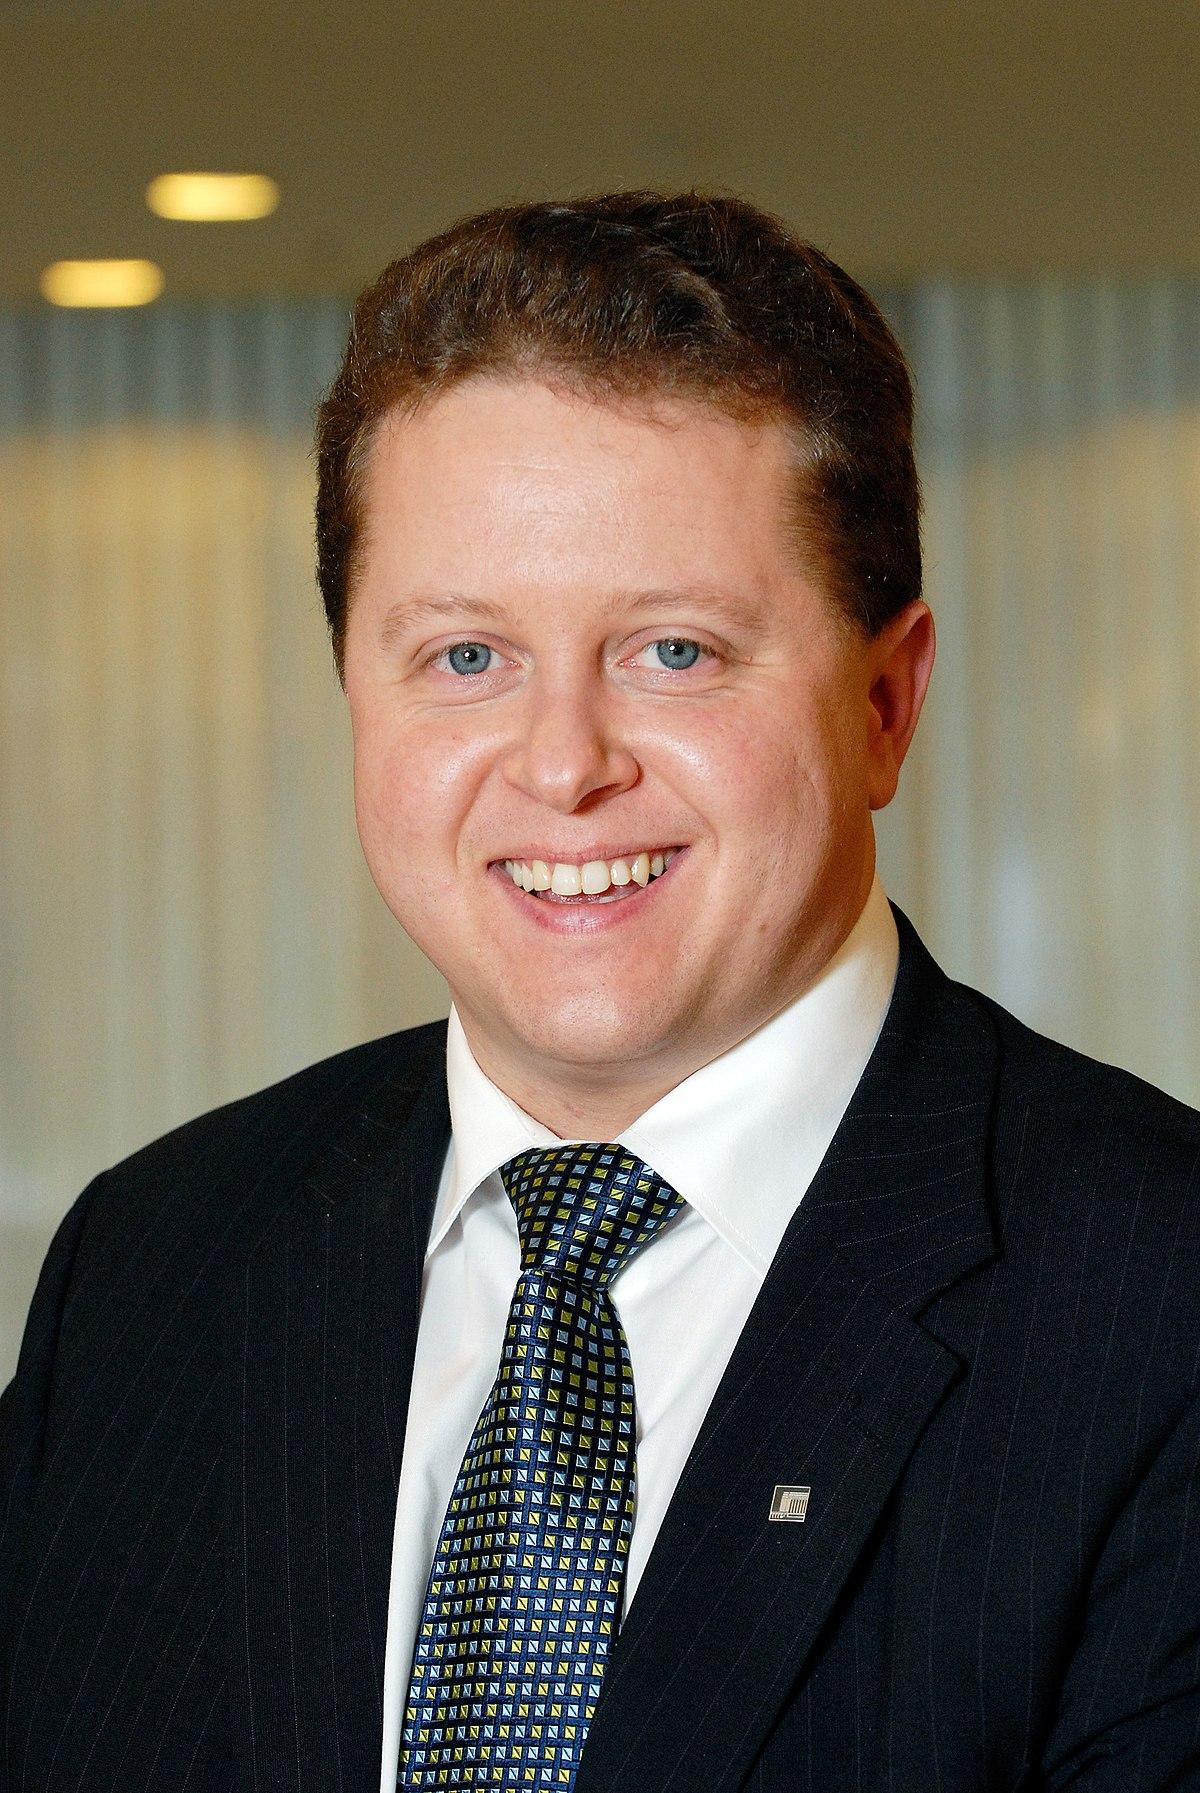 Janne Tihinen